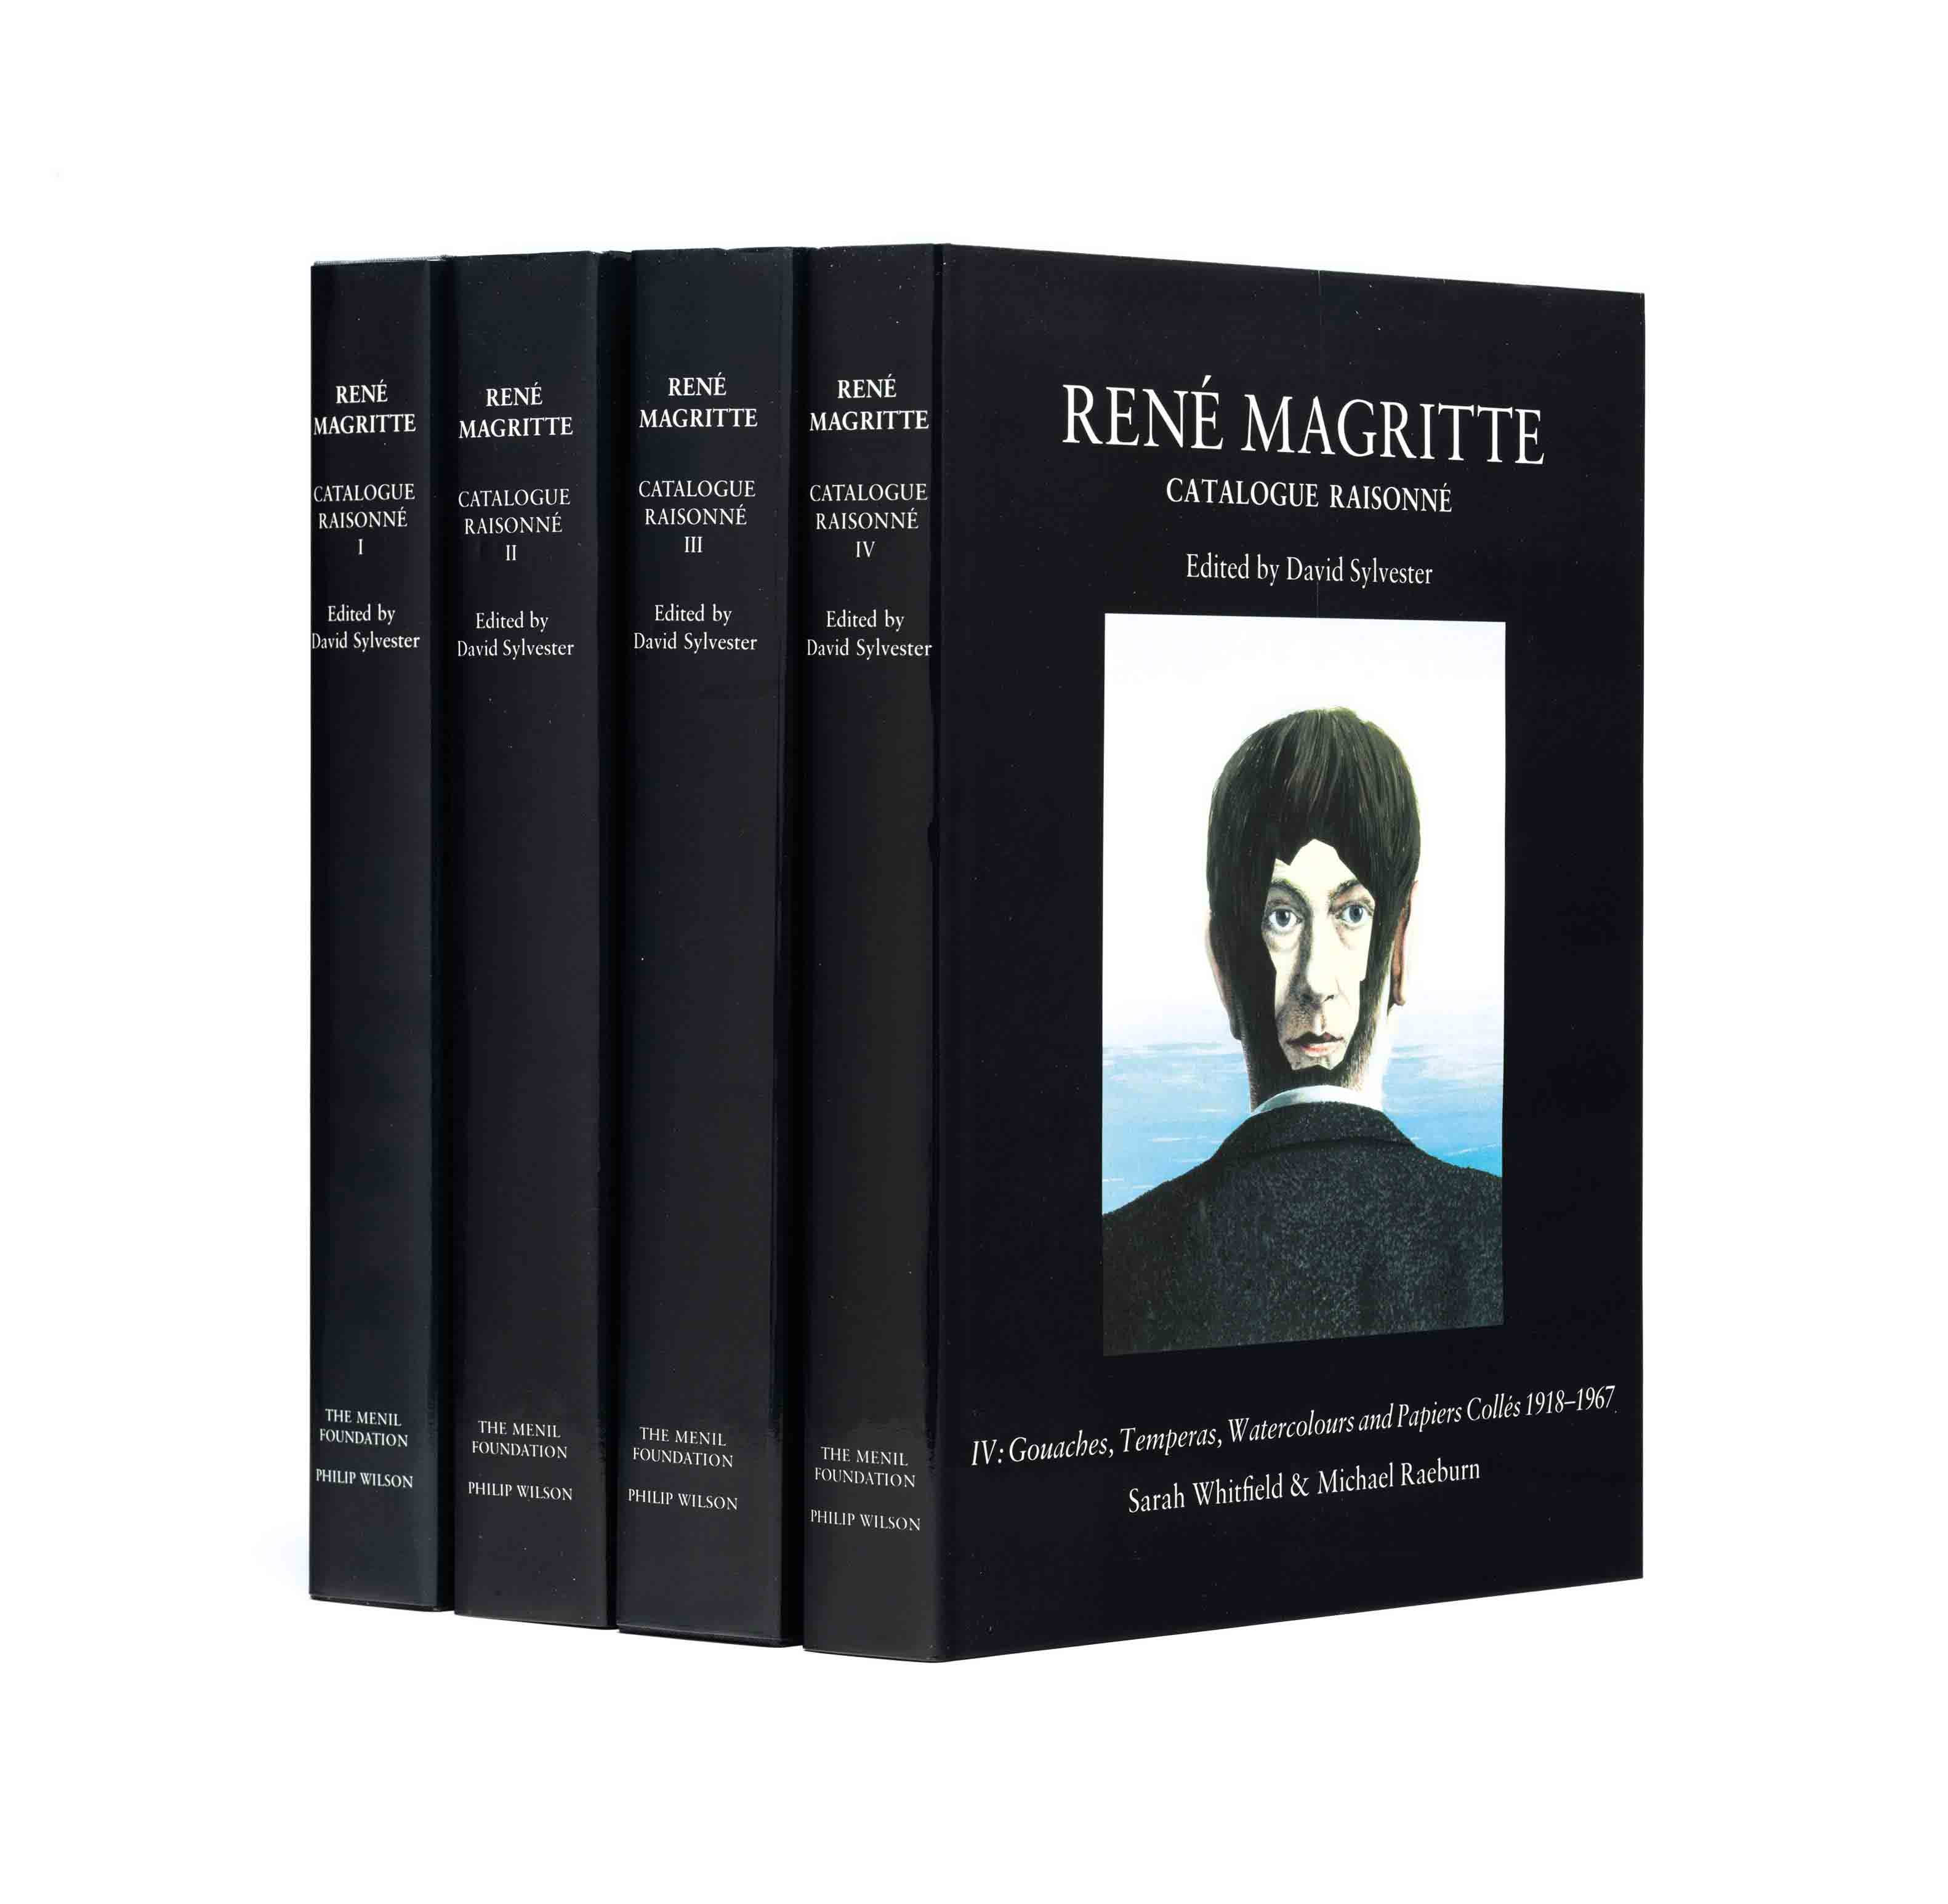 [MAGRITTE, René (1898-1967)].